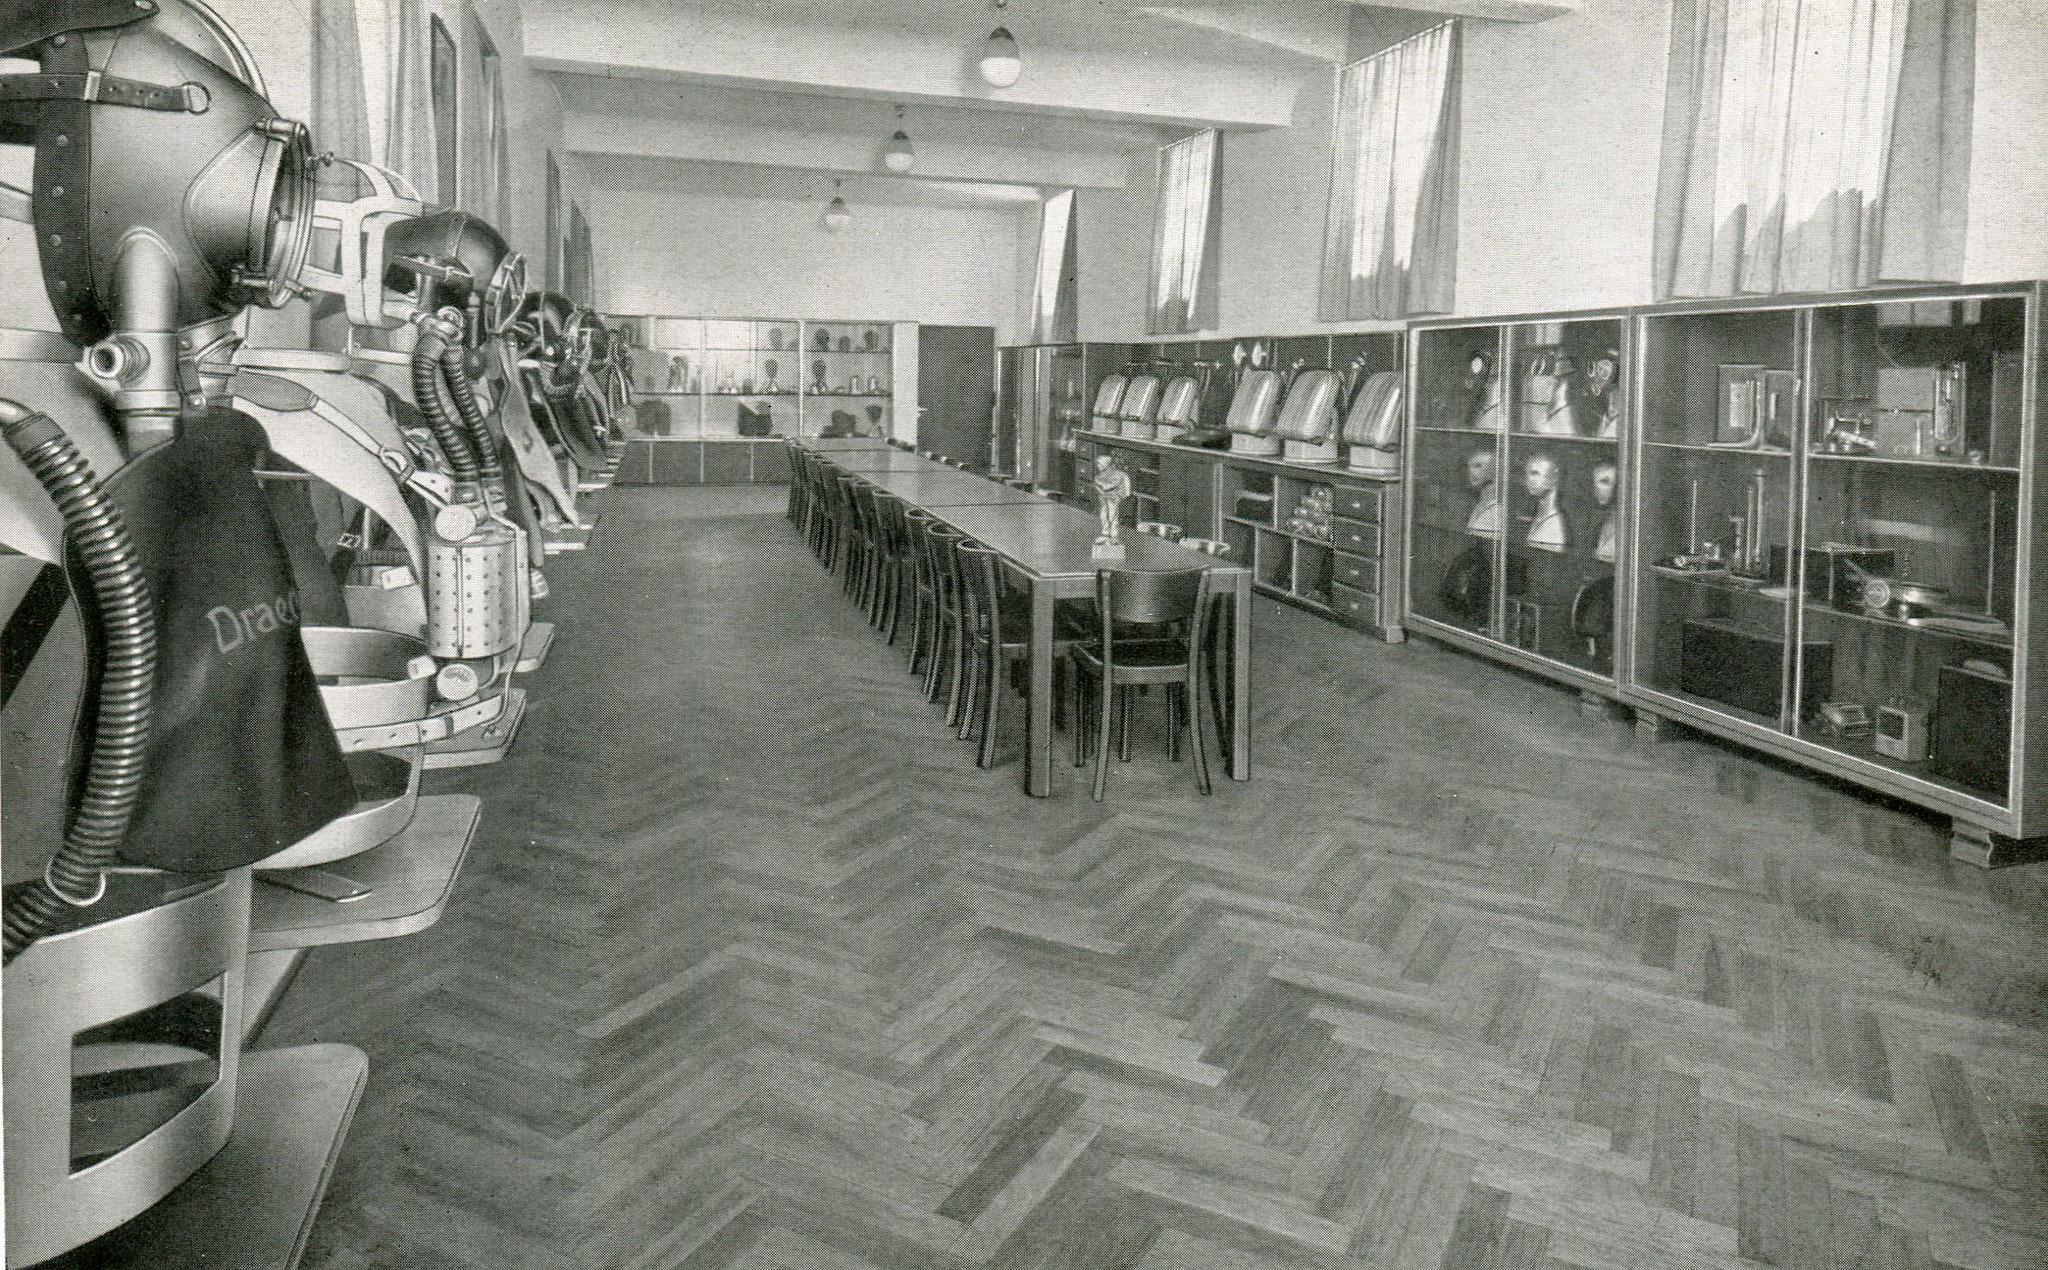 Geräte und Lehrsaal Duisburg-Hamborn Direktionsgebäude  1937